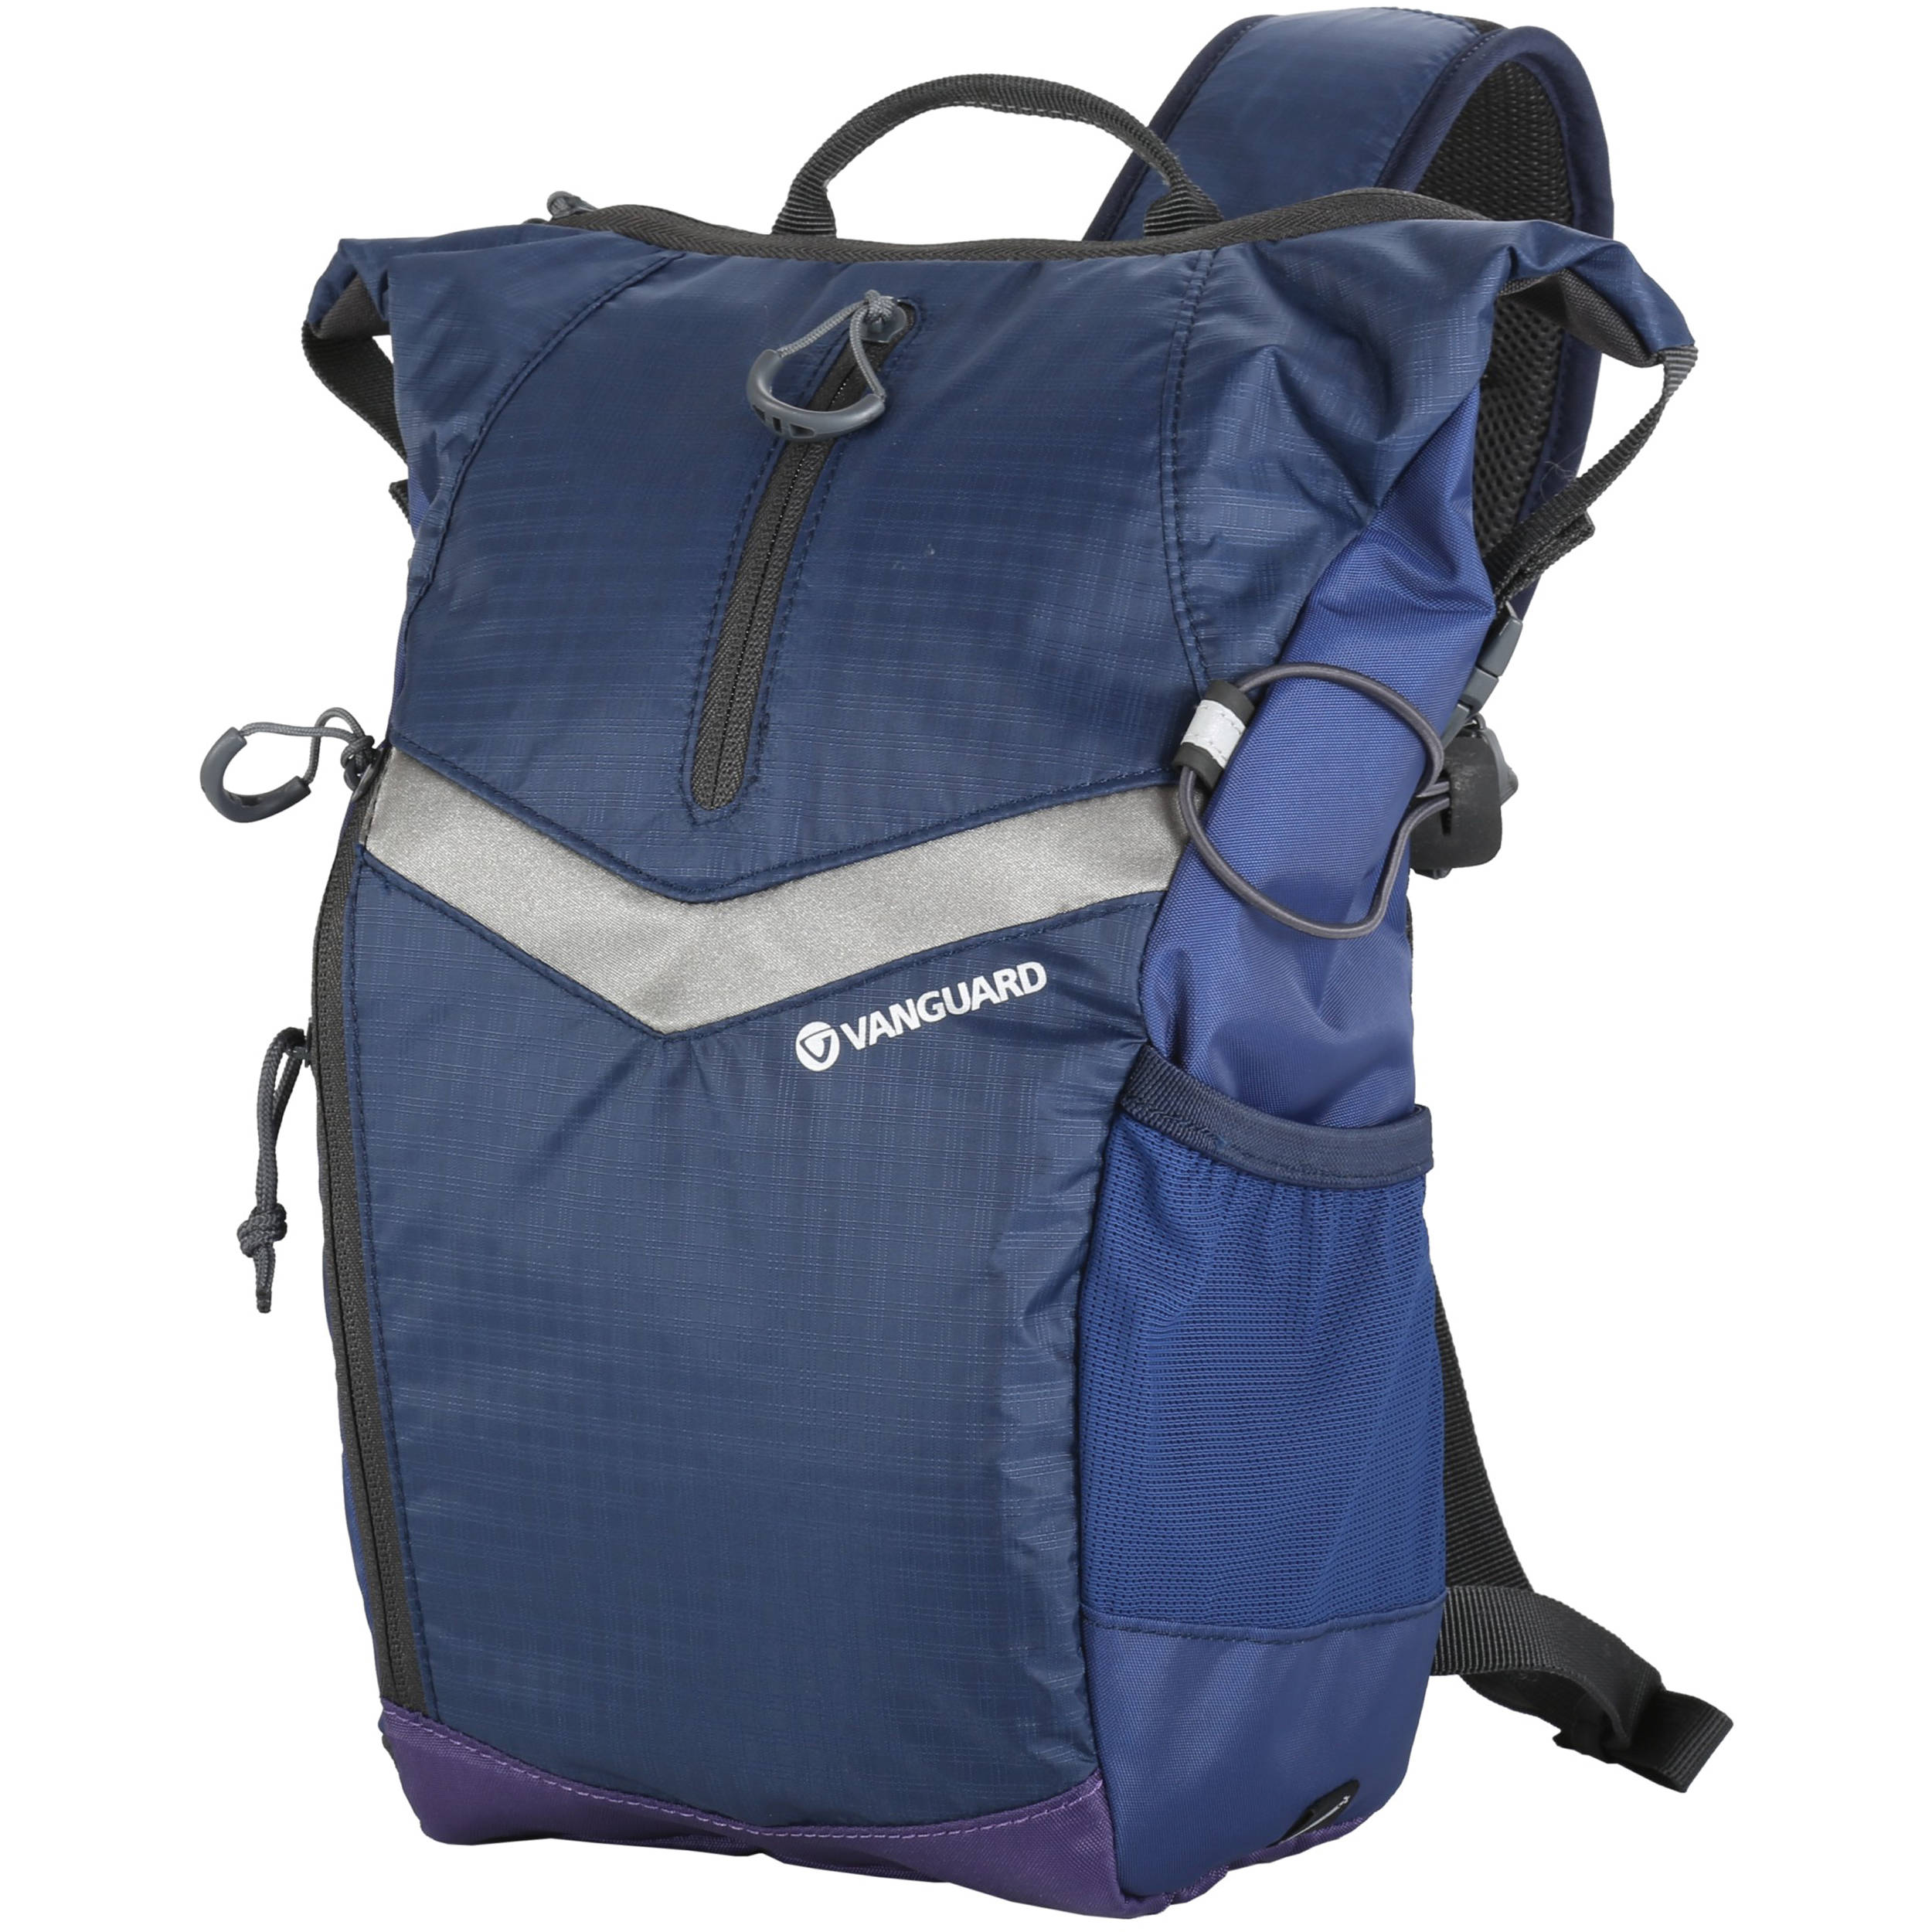 Vanguard Reno 34 Dslr Sling Bag Blue